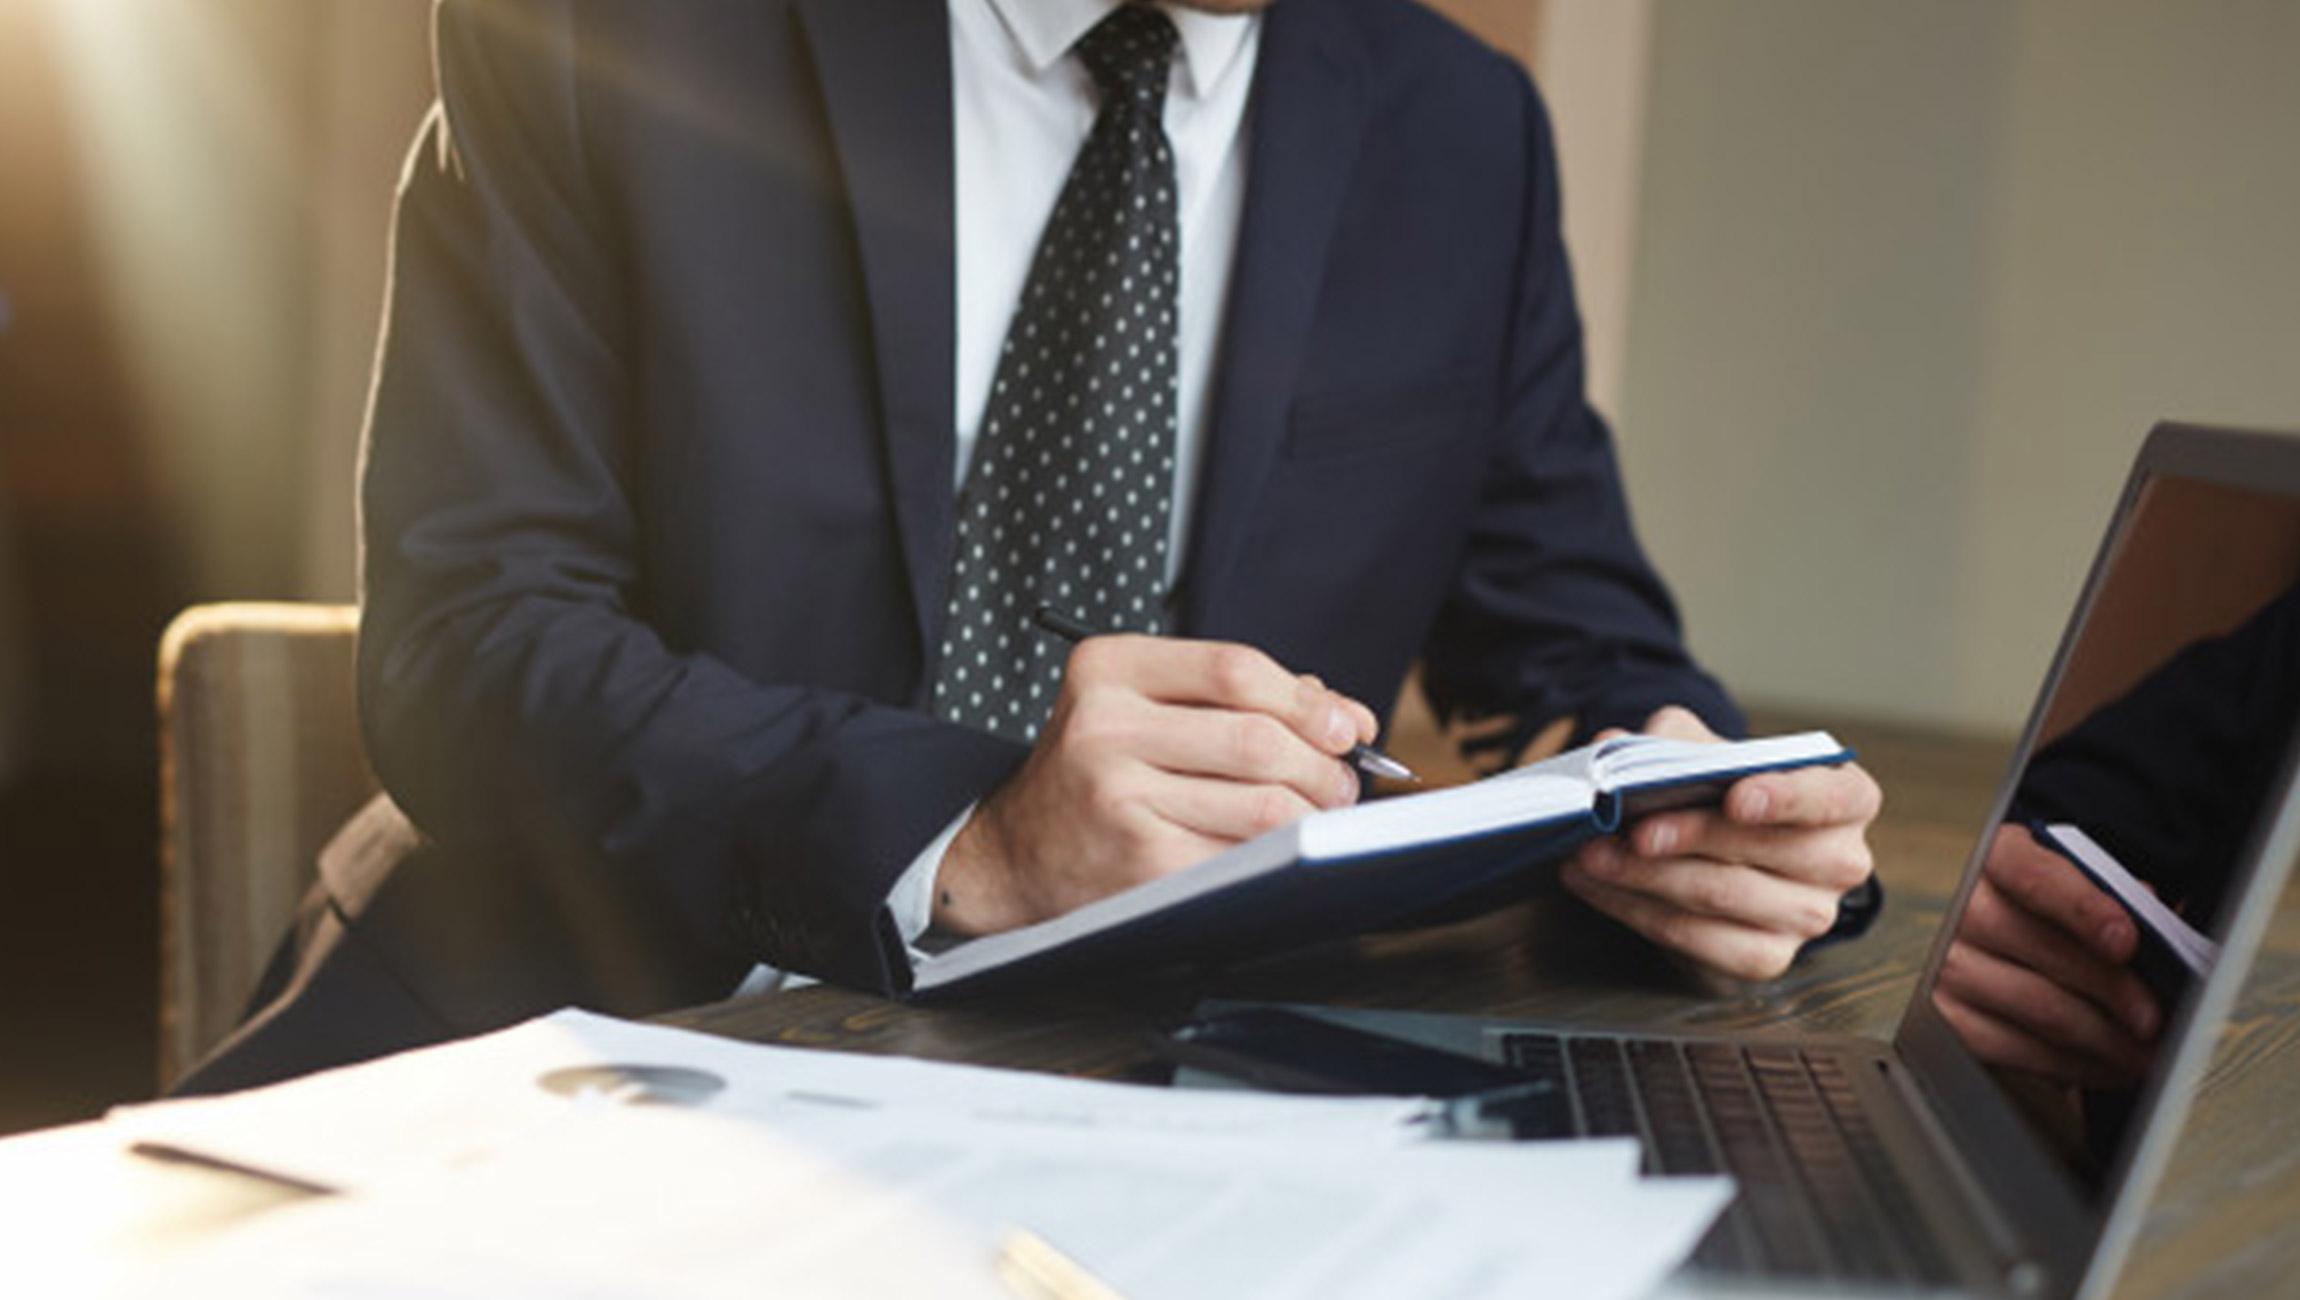 InfoSystems Moves into 2021 Maintaining their Elite IBM Platinum Business Partner Status